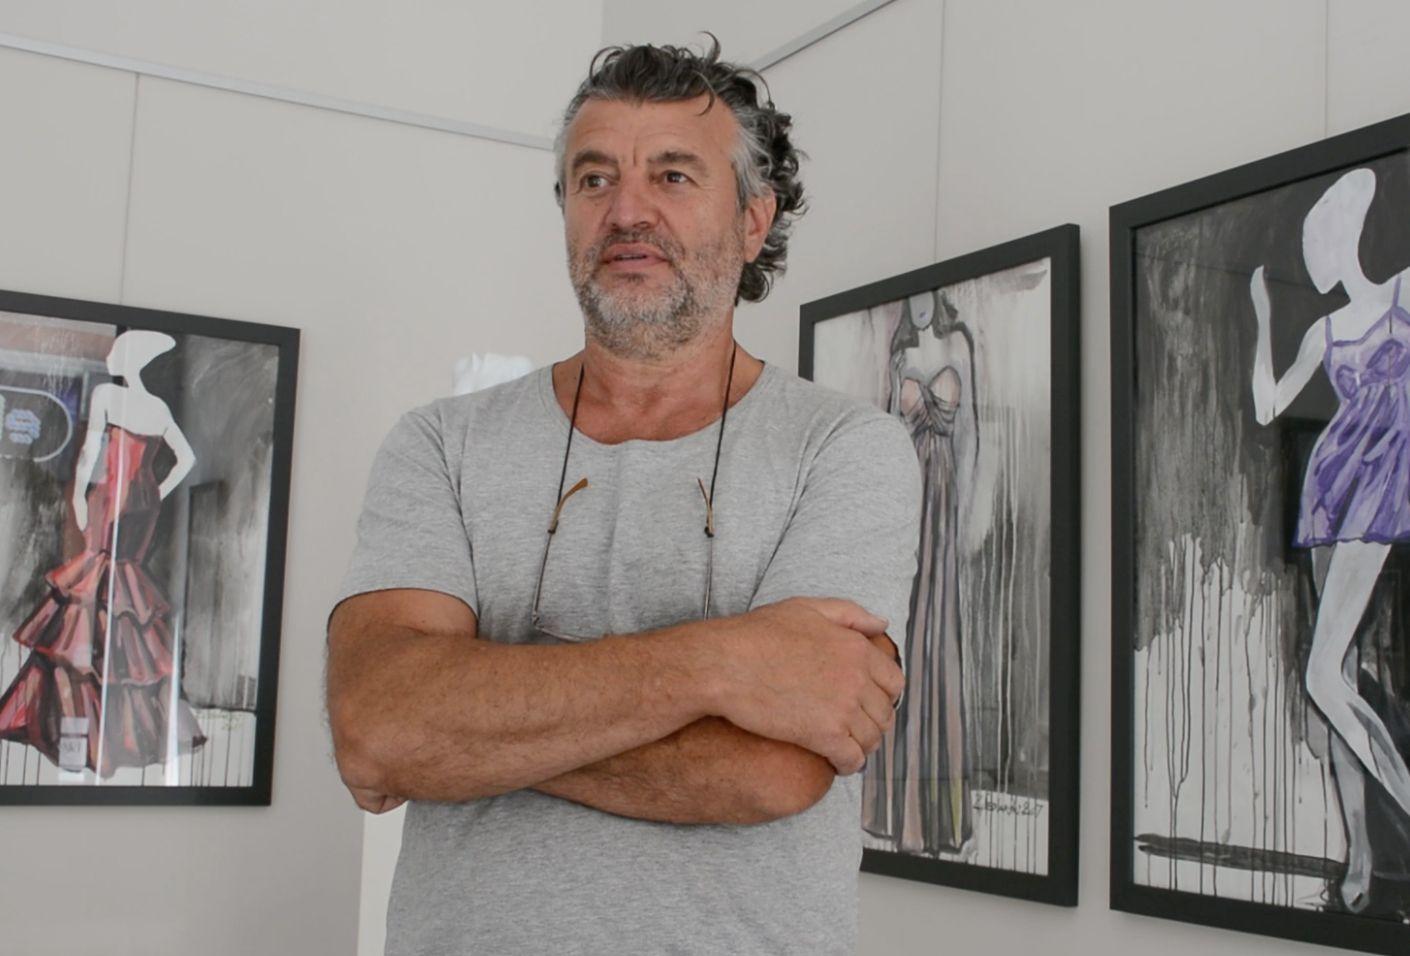 Jivko Sedlarski